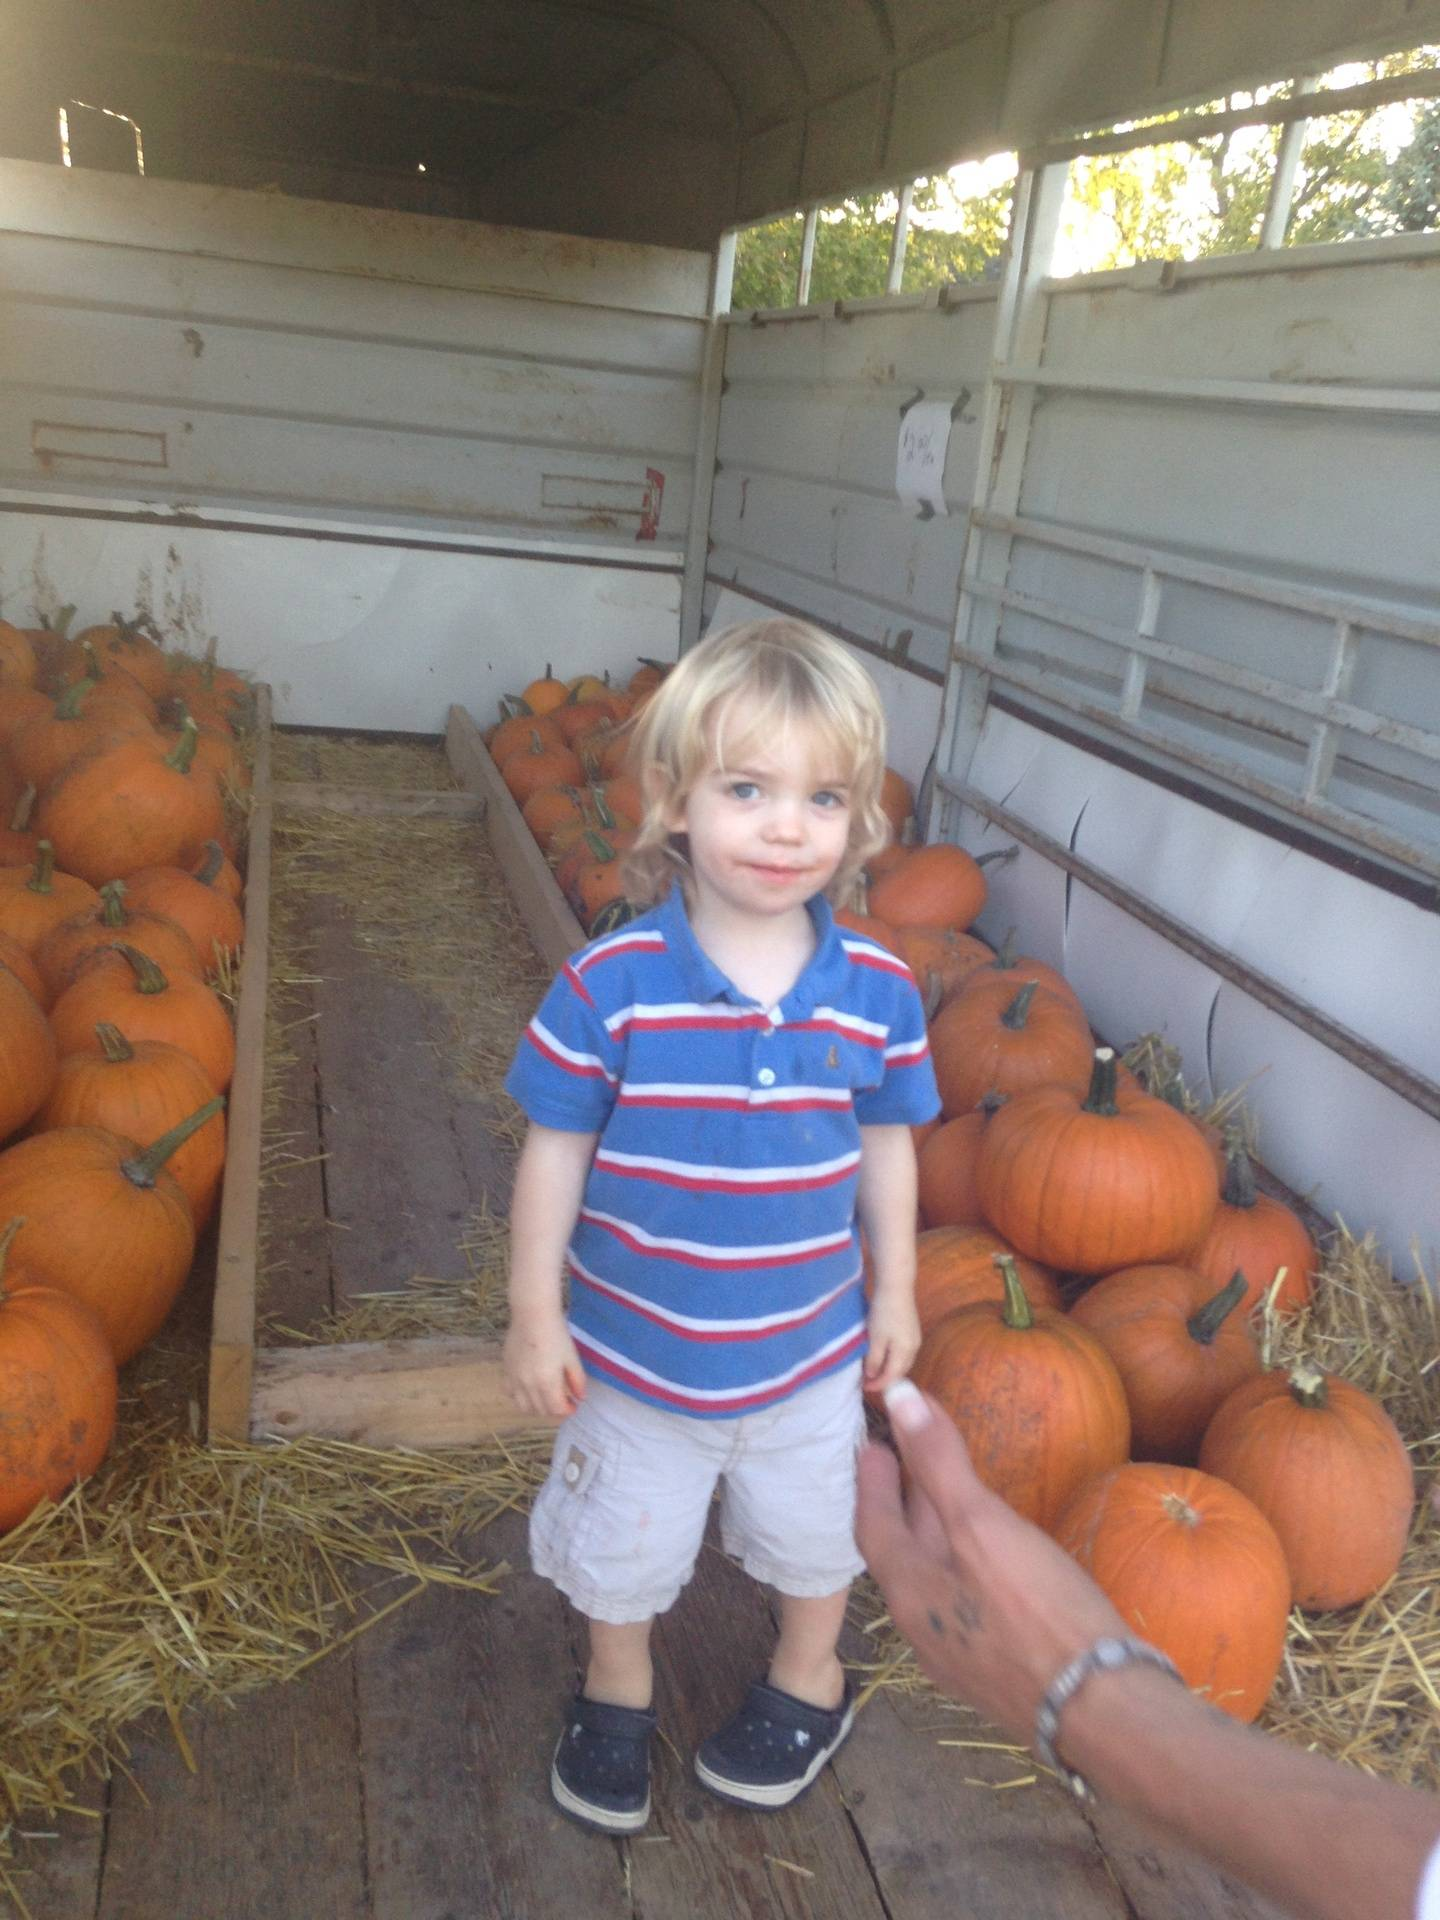 Come pick a pumpkin for Halloween!